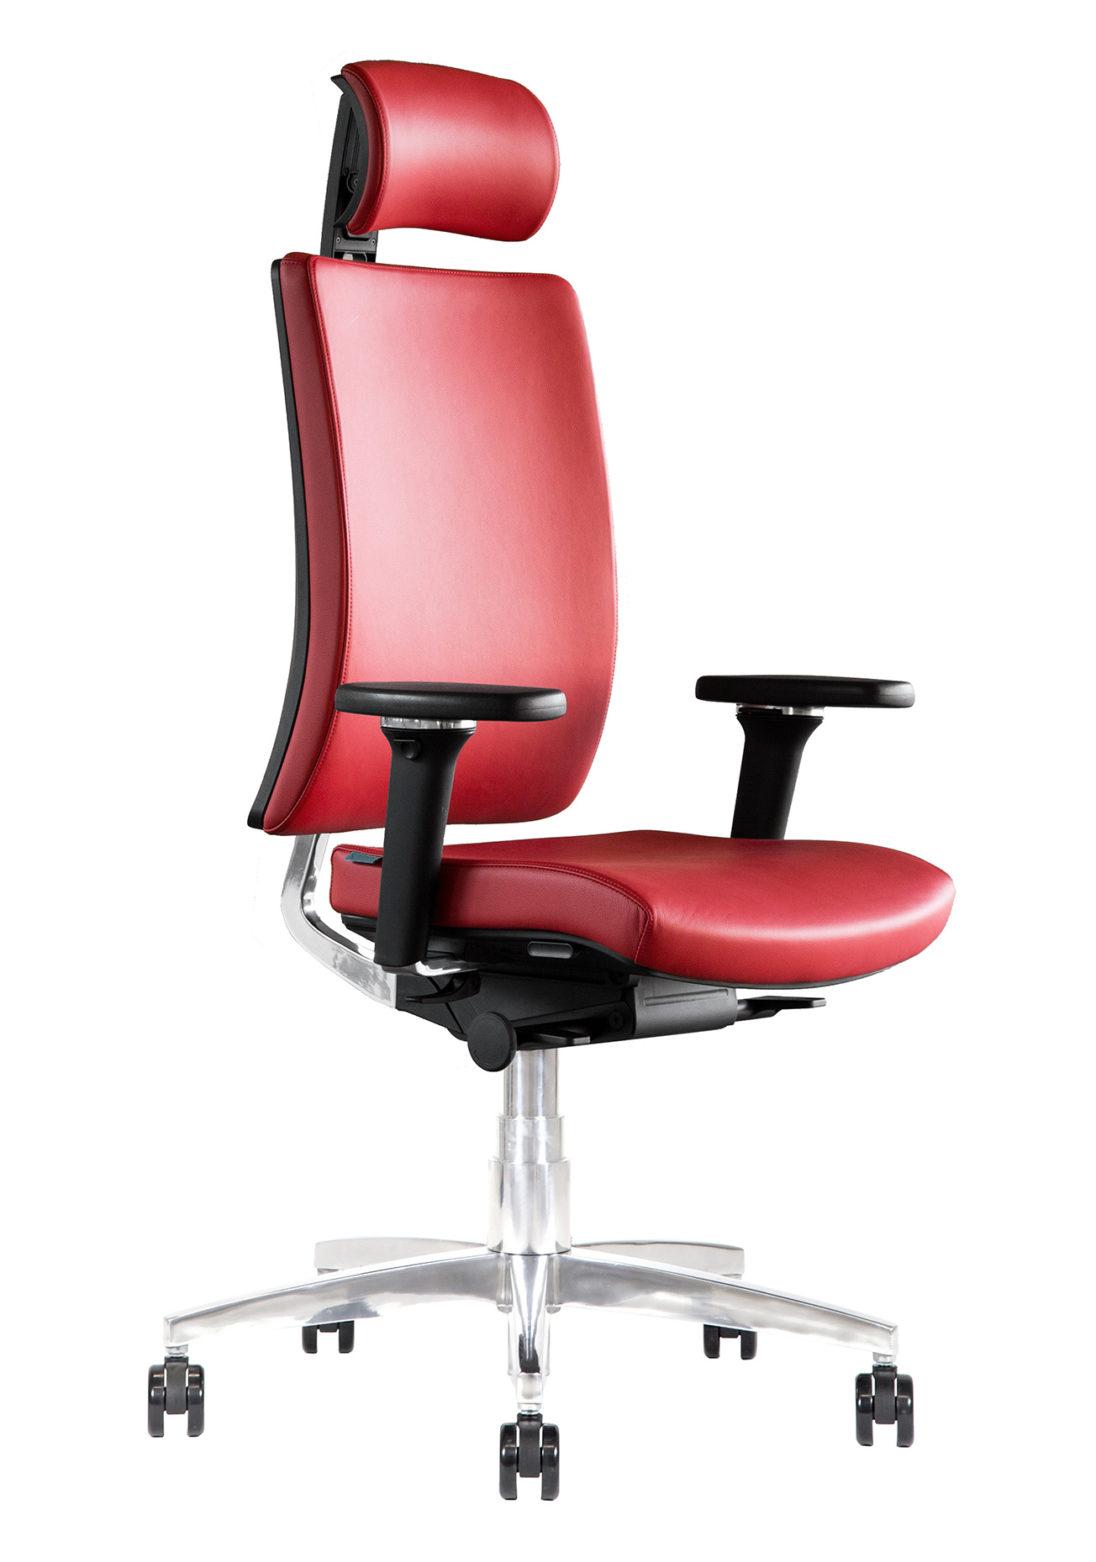 Sedie ufficio direzionali BB200 - Kleos - Compositeur d'Espace